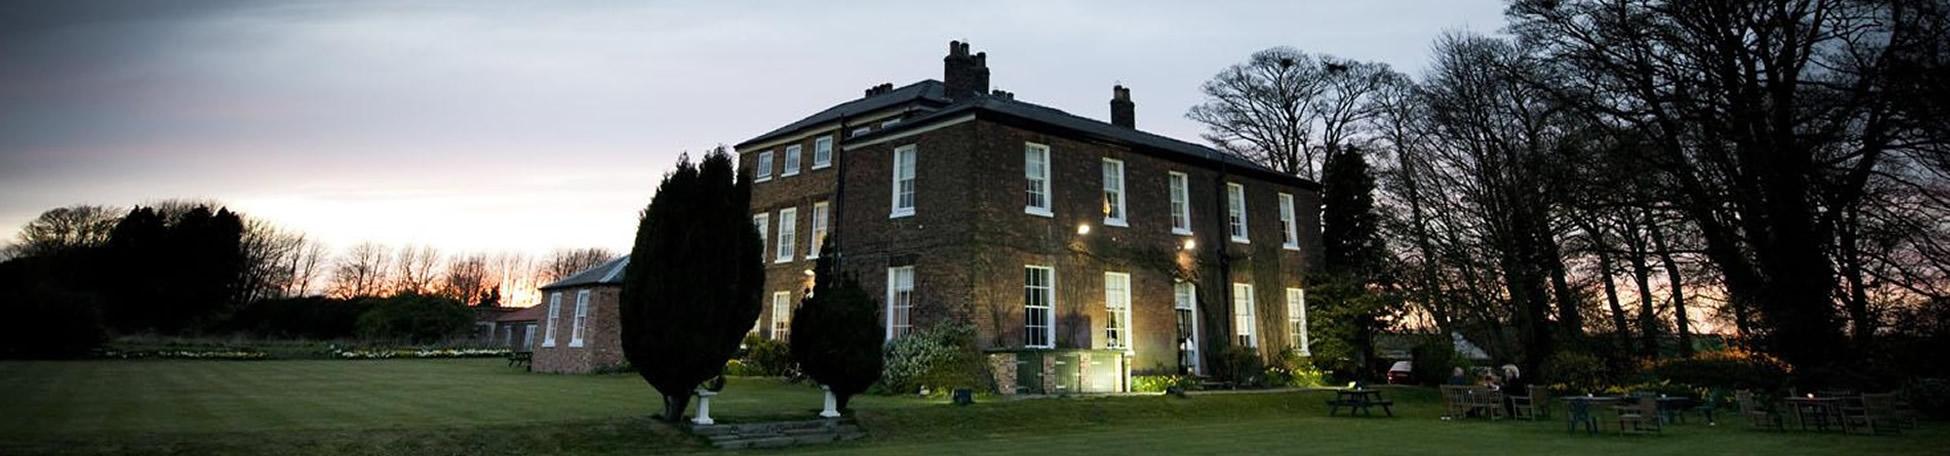 Rowley Manor House